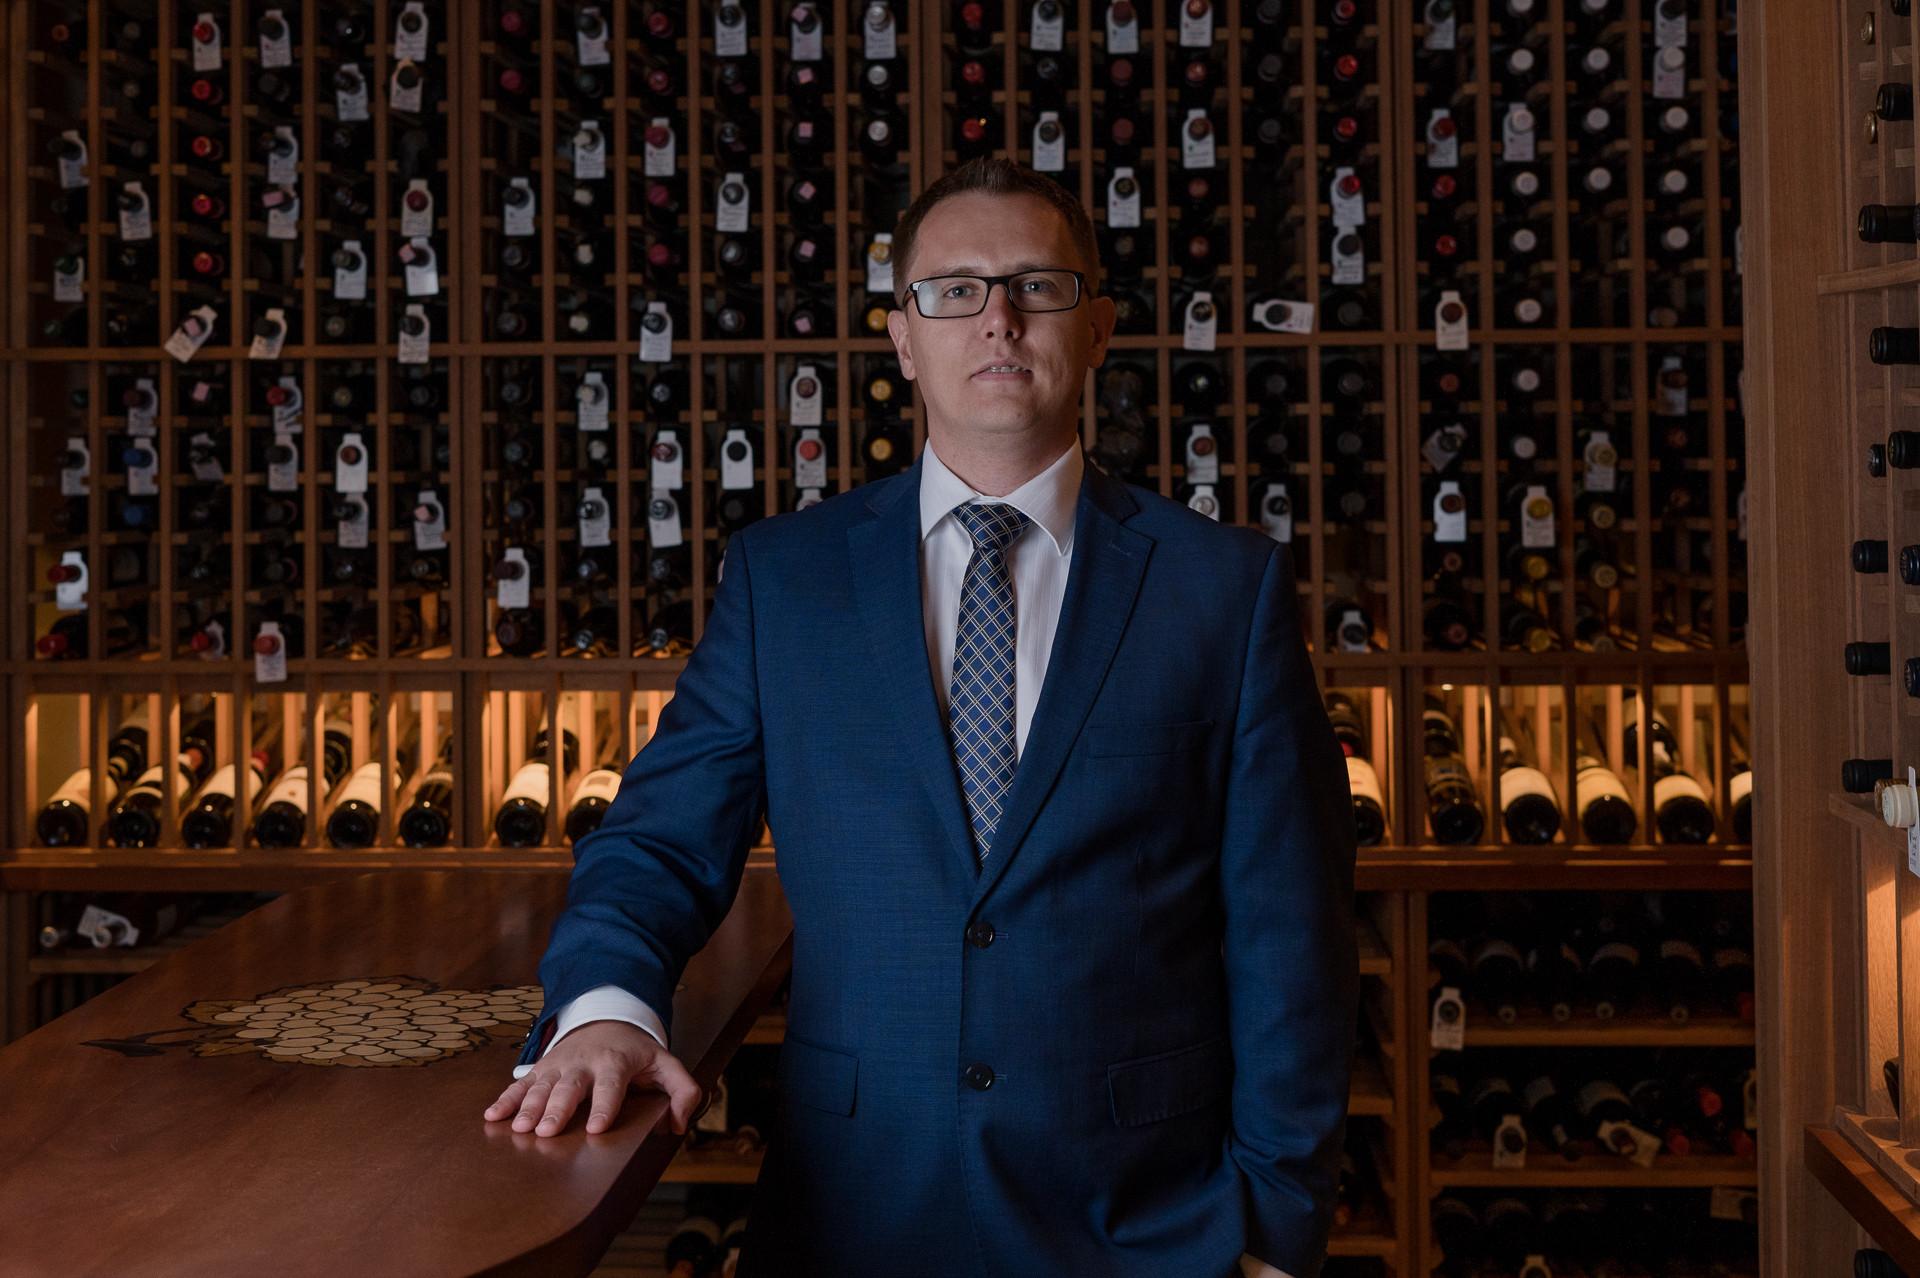 Corporate Headshot for Konstantin Kuligin, Wine Cellar